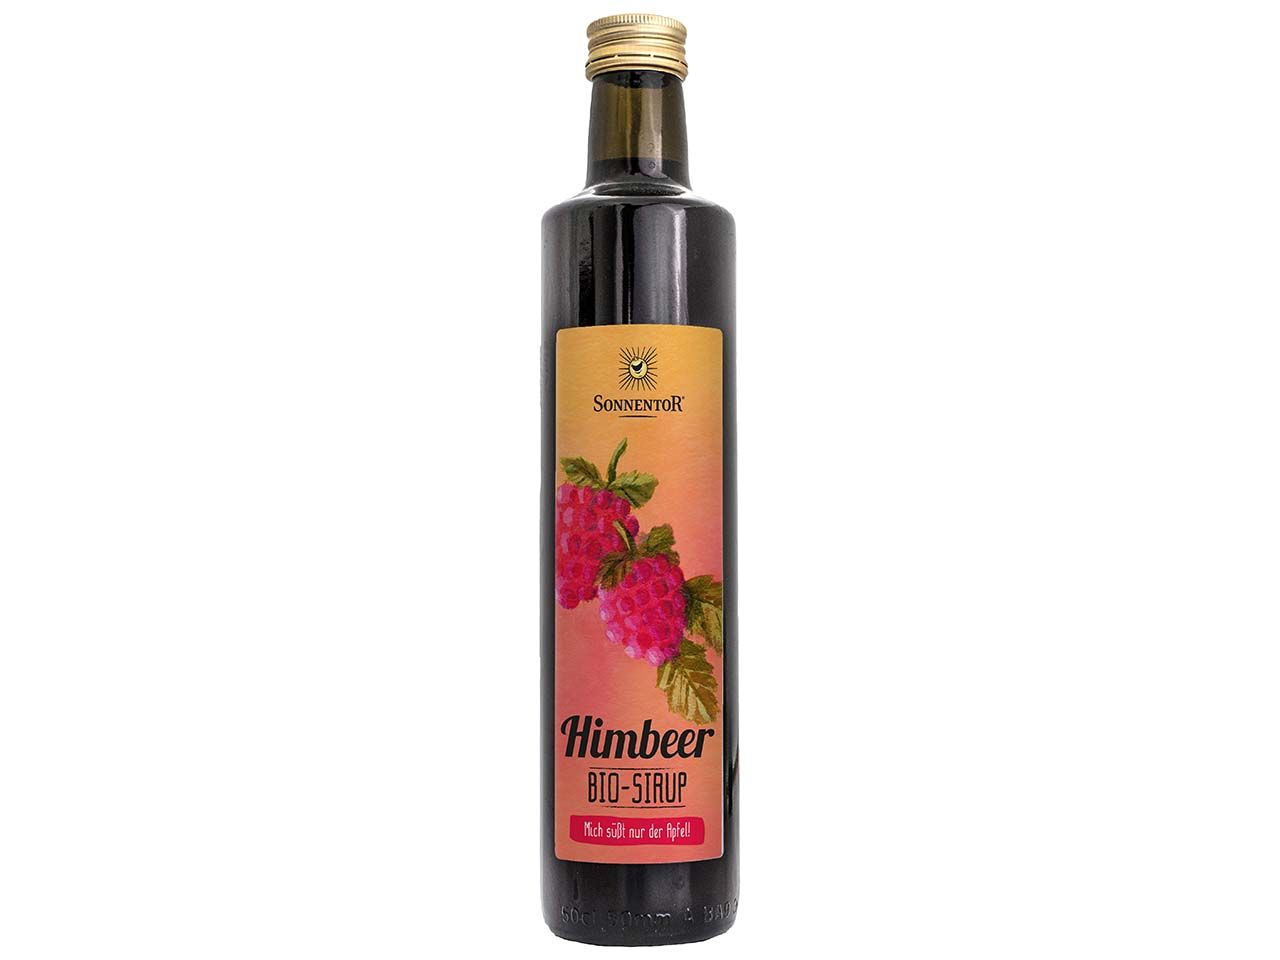 Sonnentor Bio-Himbeer-Sirup, 500 ml 00603